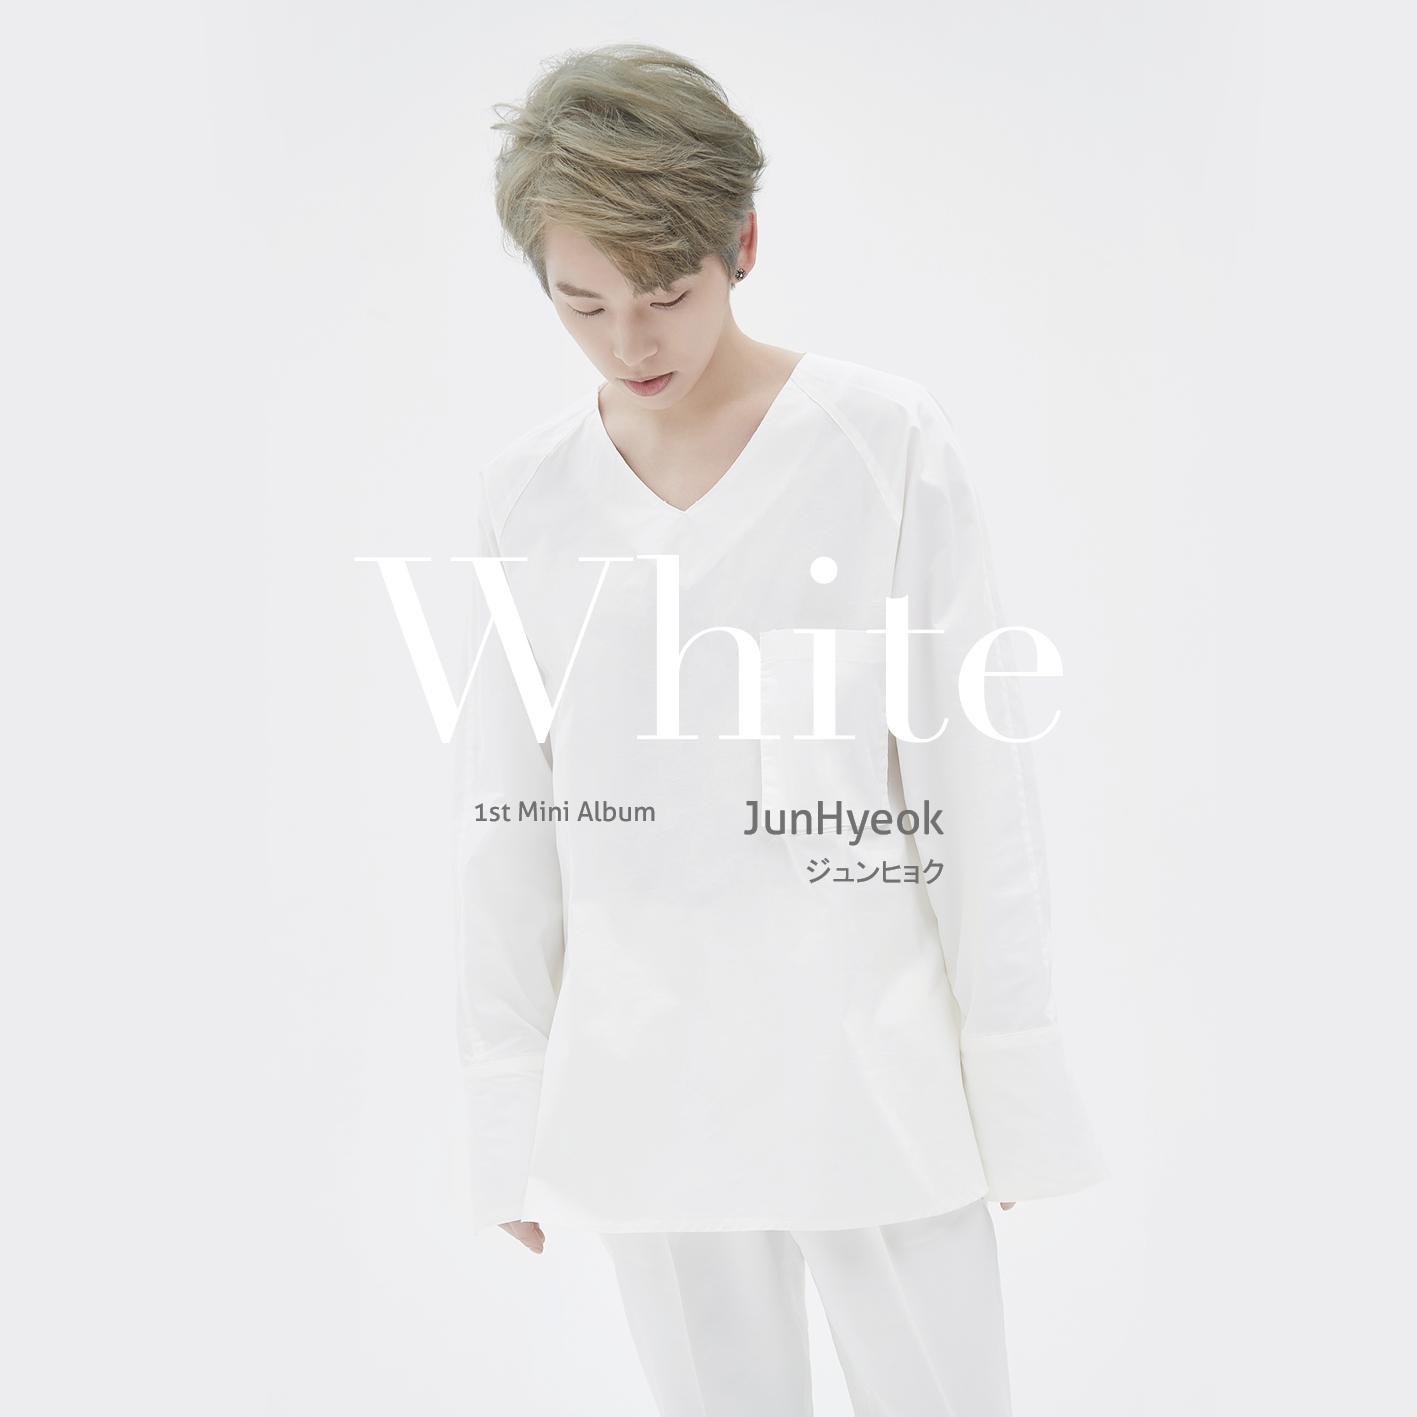 JunHyeok 1st Mini Album「White」release SHOWCASE チケット販売中‼